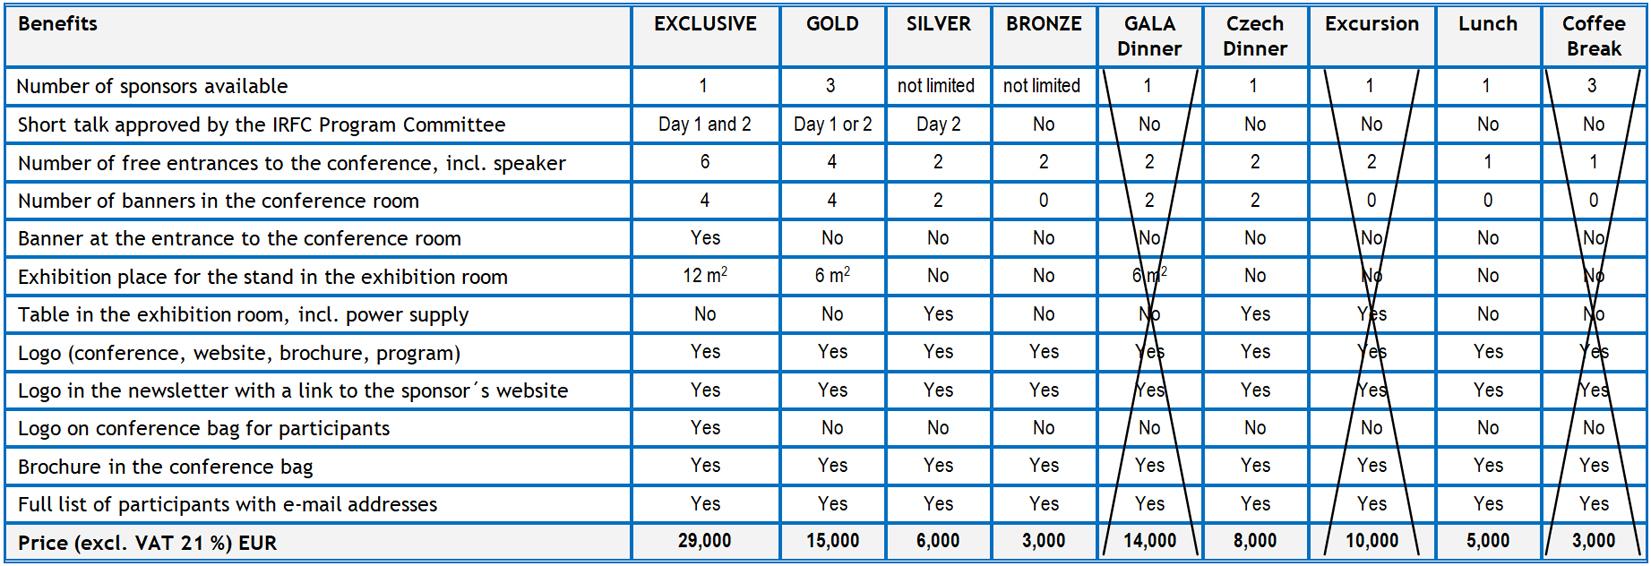 Sponsorship types comparison table